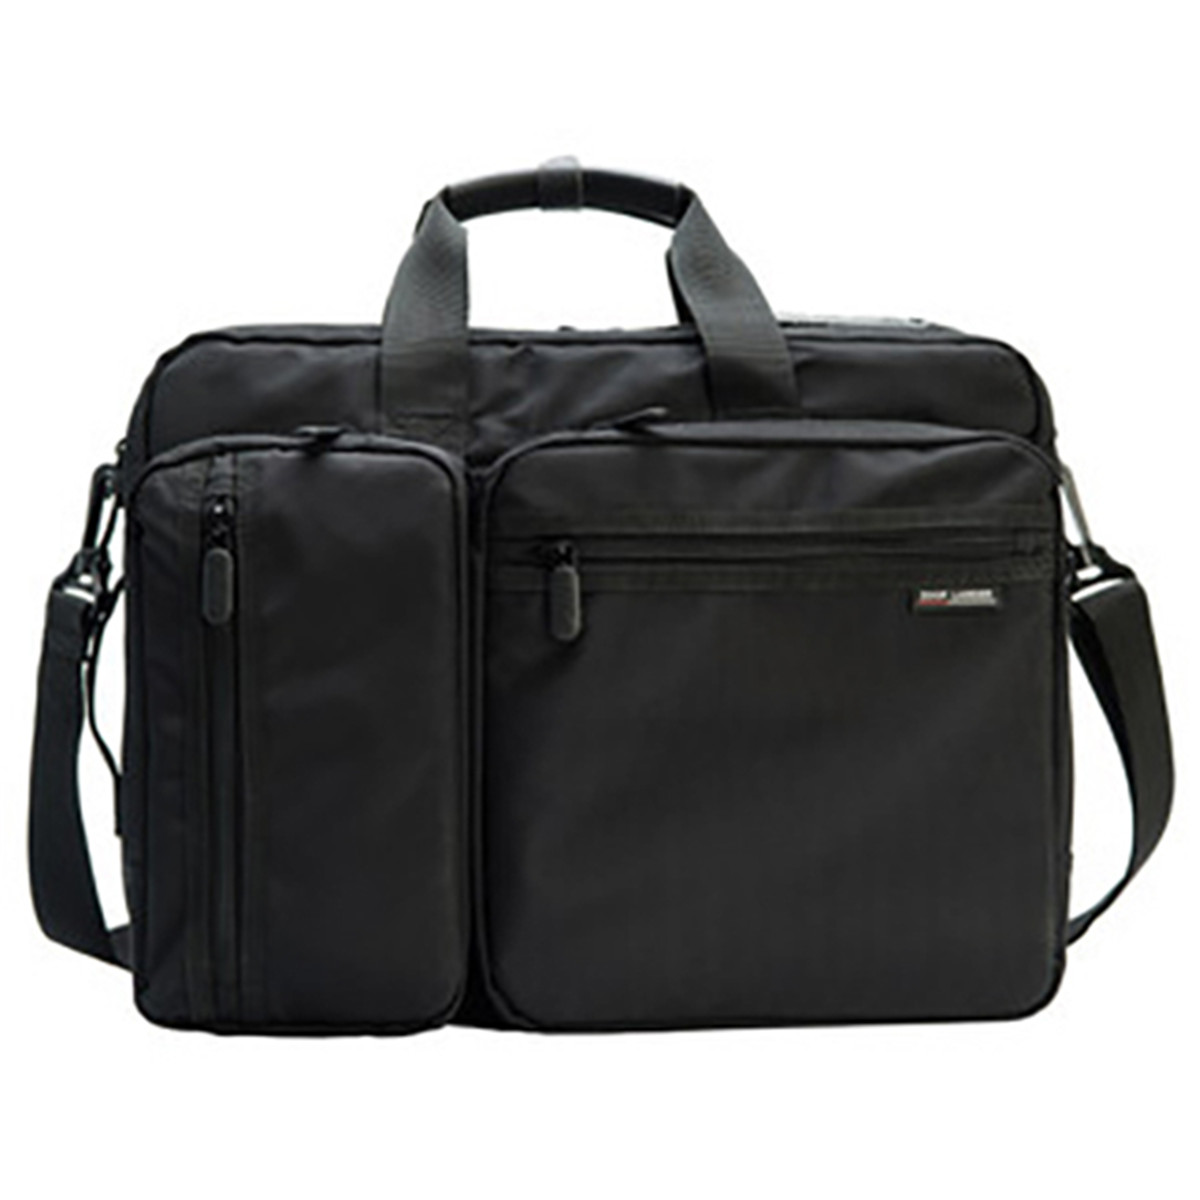 Osmond Men Anti theft Briefcase Expandable Multi pocket Waterproof Laptop Bag Large Capacity Travel Bags Multipurpose Handbags